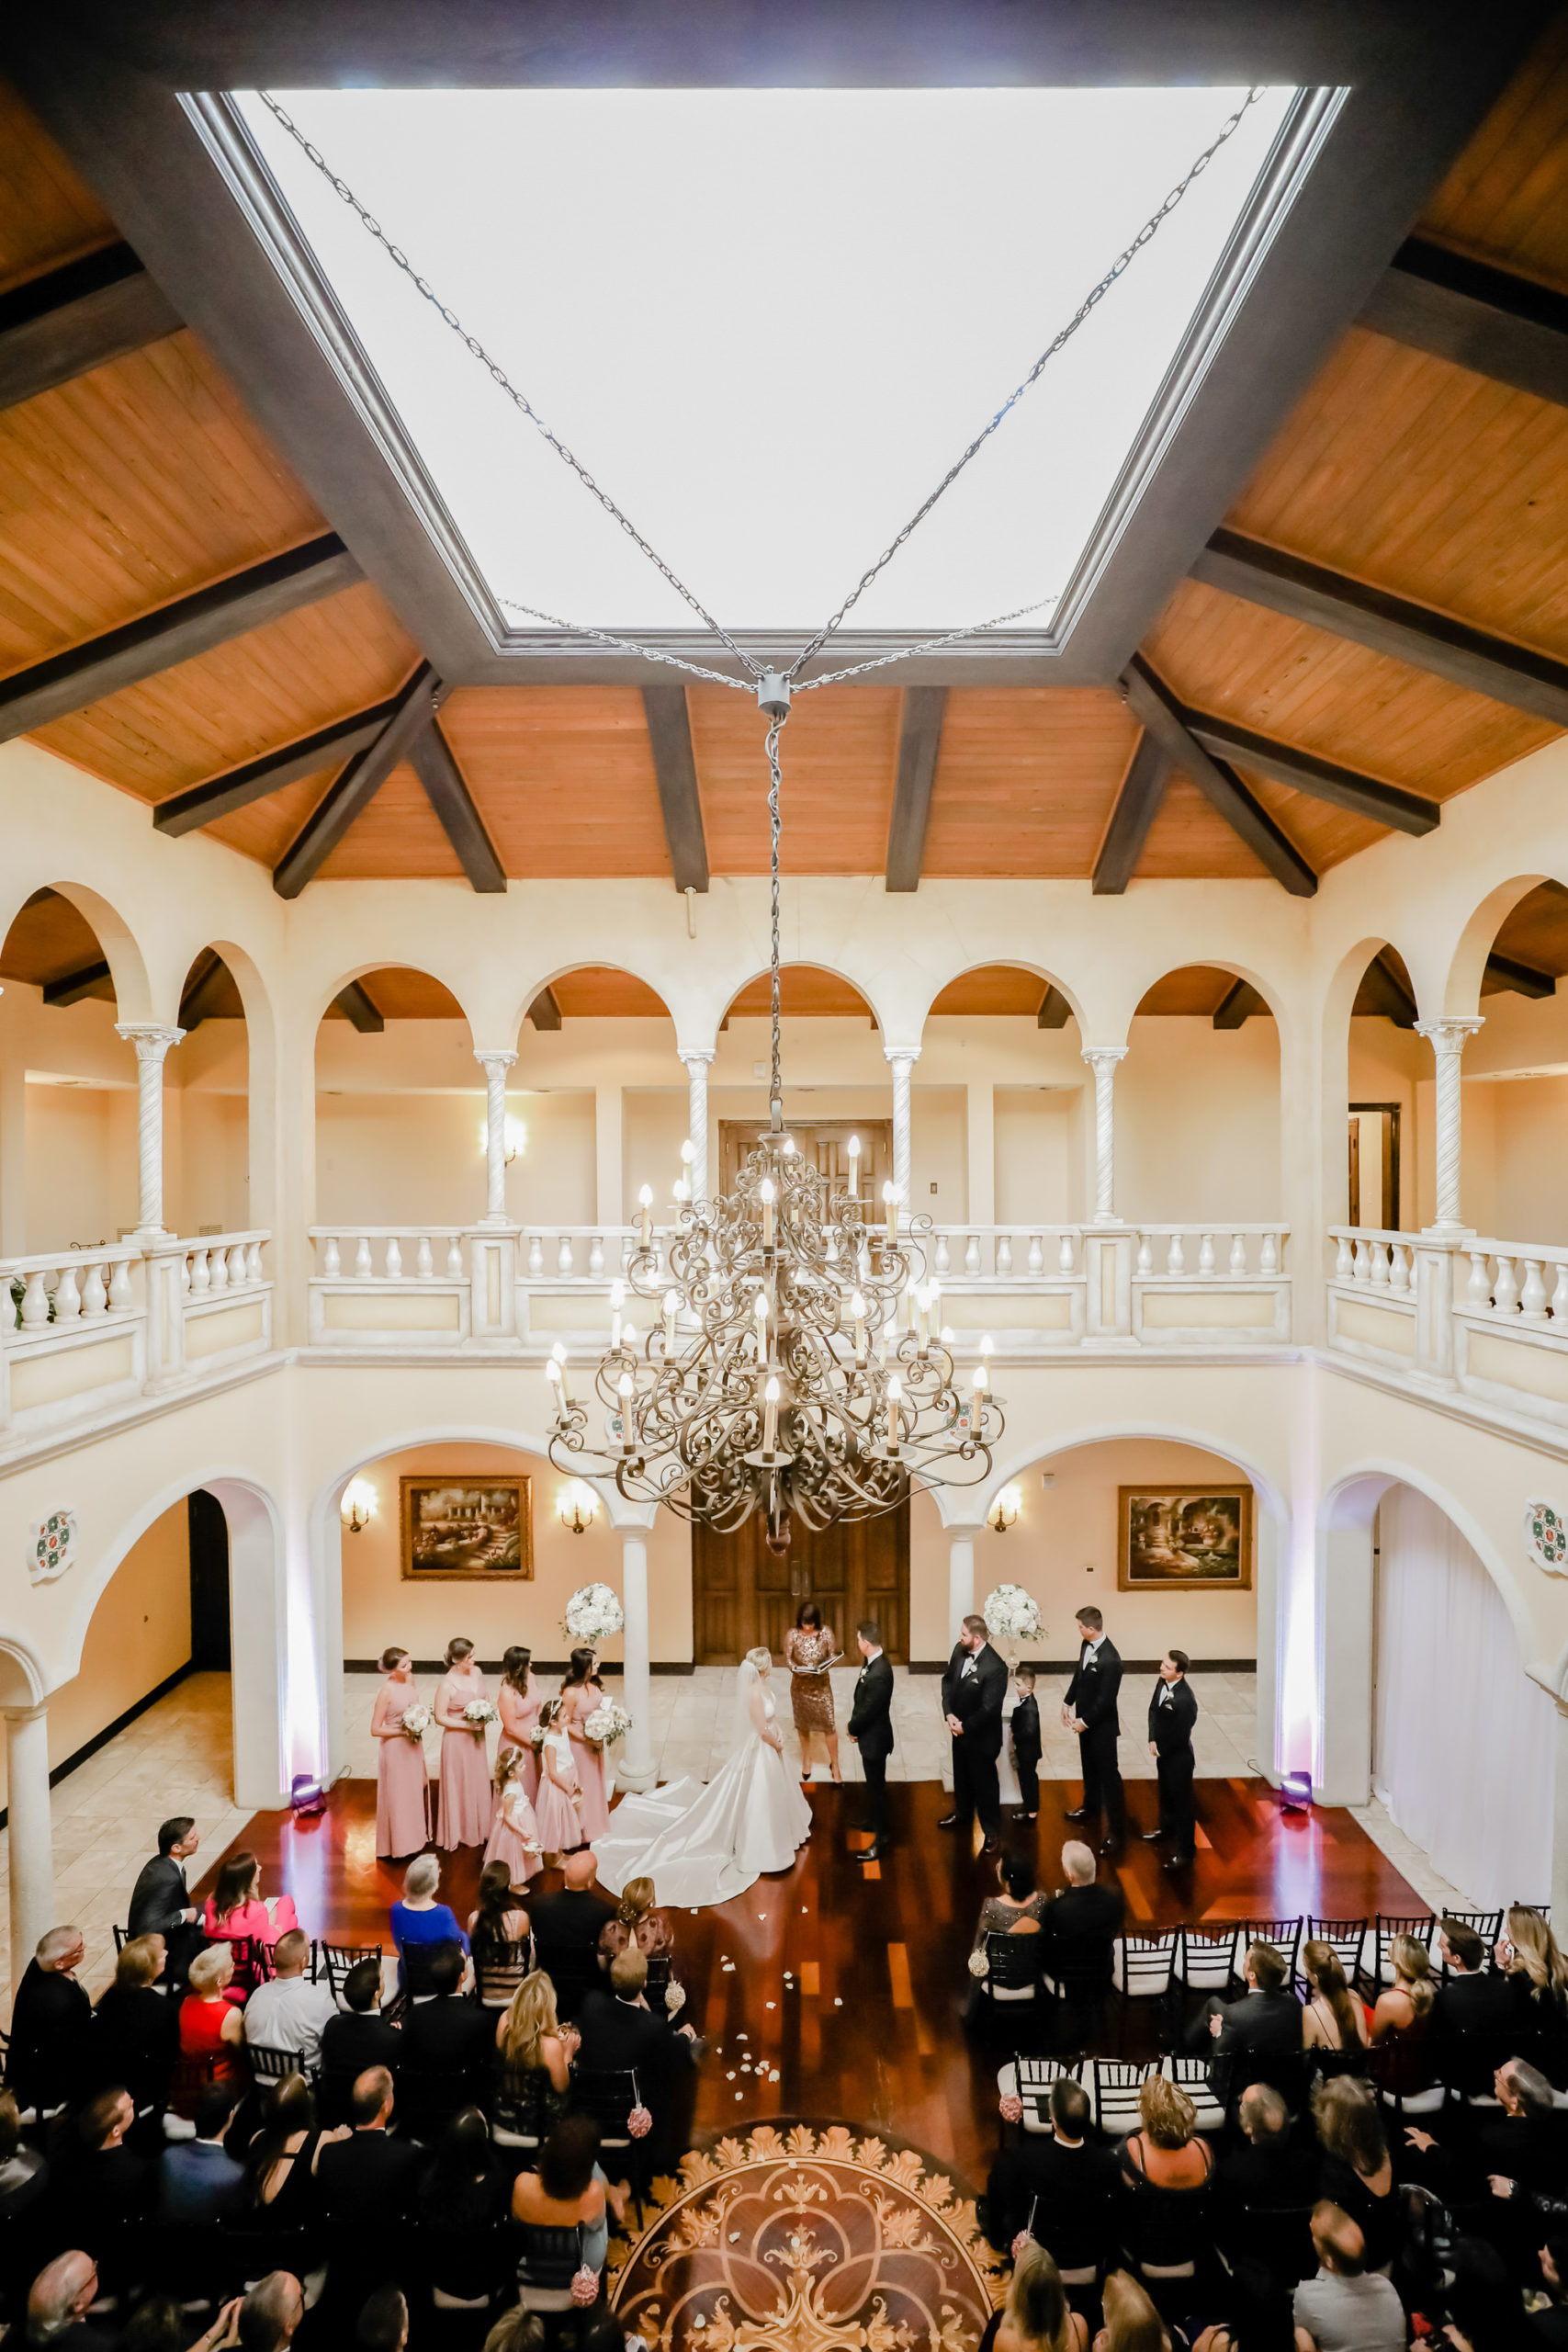 Tampa Wedding Venue Avila Golf & Country Club | Indoor Ceremony with Chiavari Chairs and Chandelier | Tampa Bay Wedding Photographer Lifelong Photography Studio